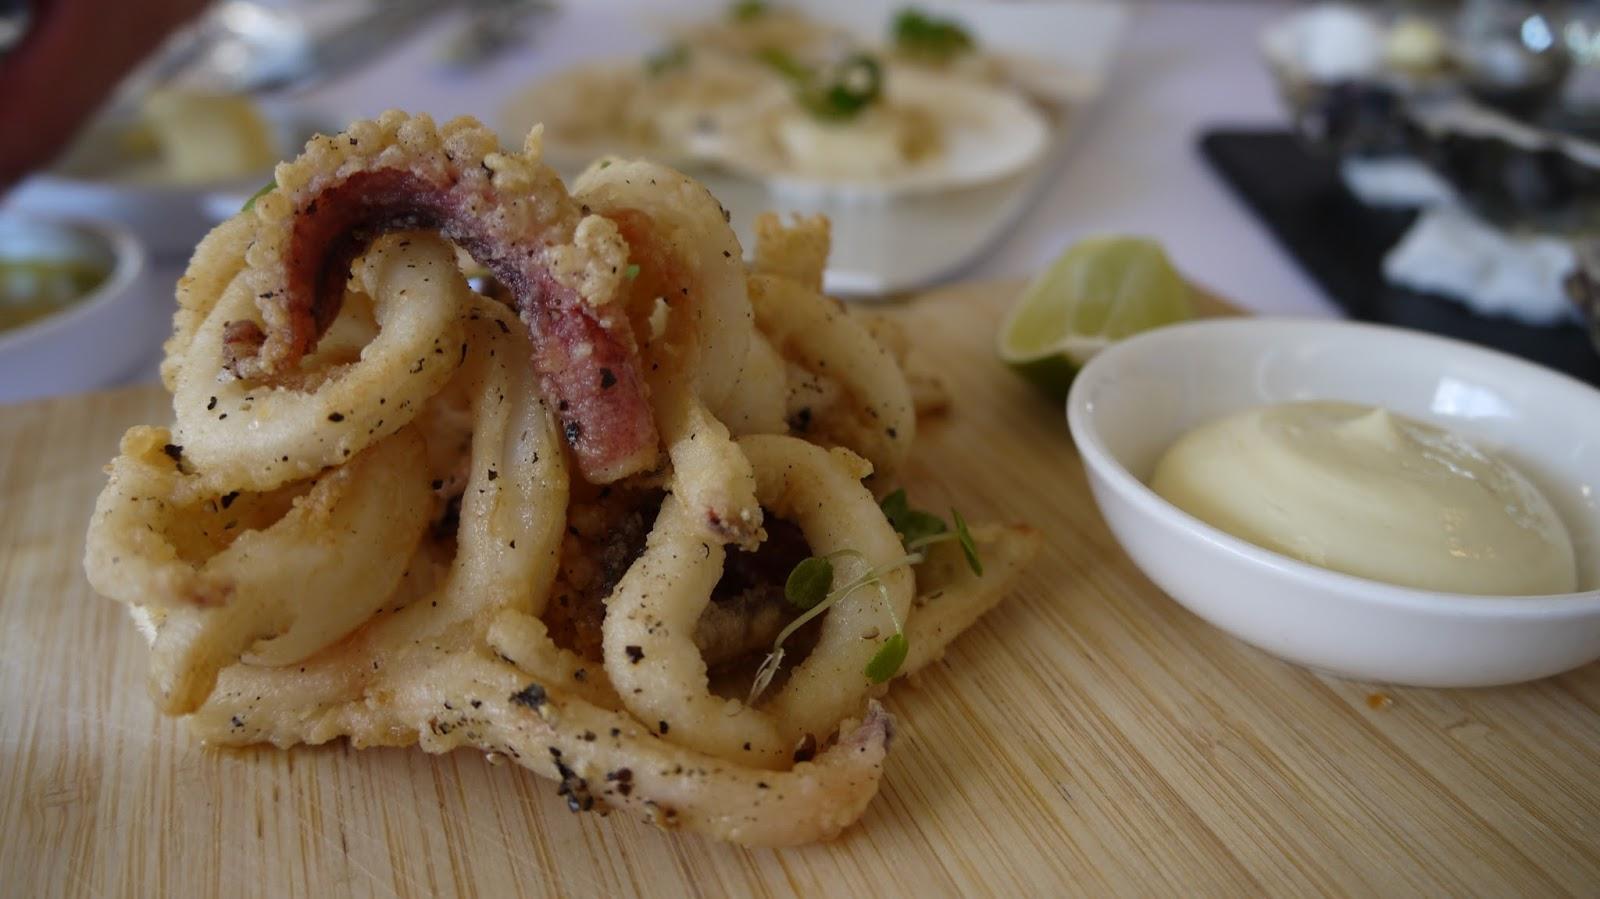 Star of Greece, Pt Willunga, Fleurieu Peninsula, Beach, SA, Adelaide, Modern Australian, Steak, Seafood, Fish, Squid